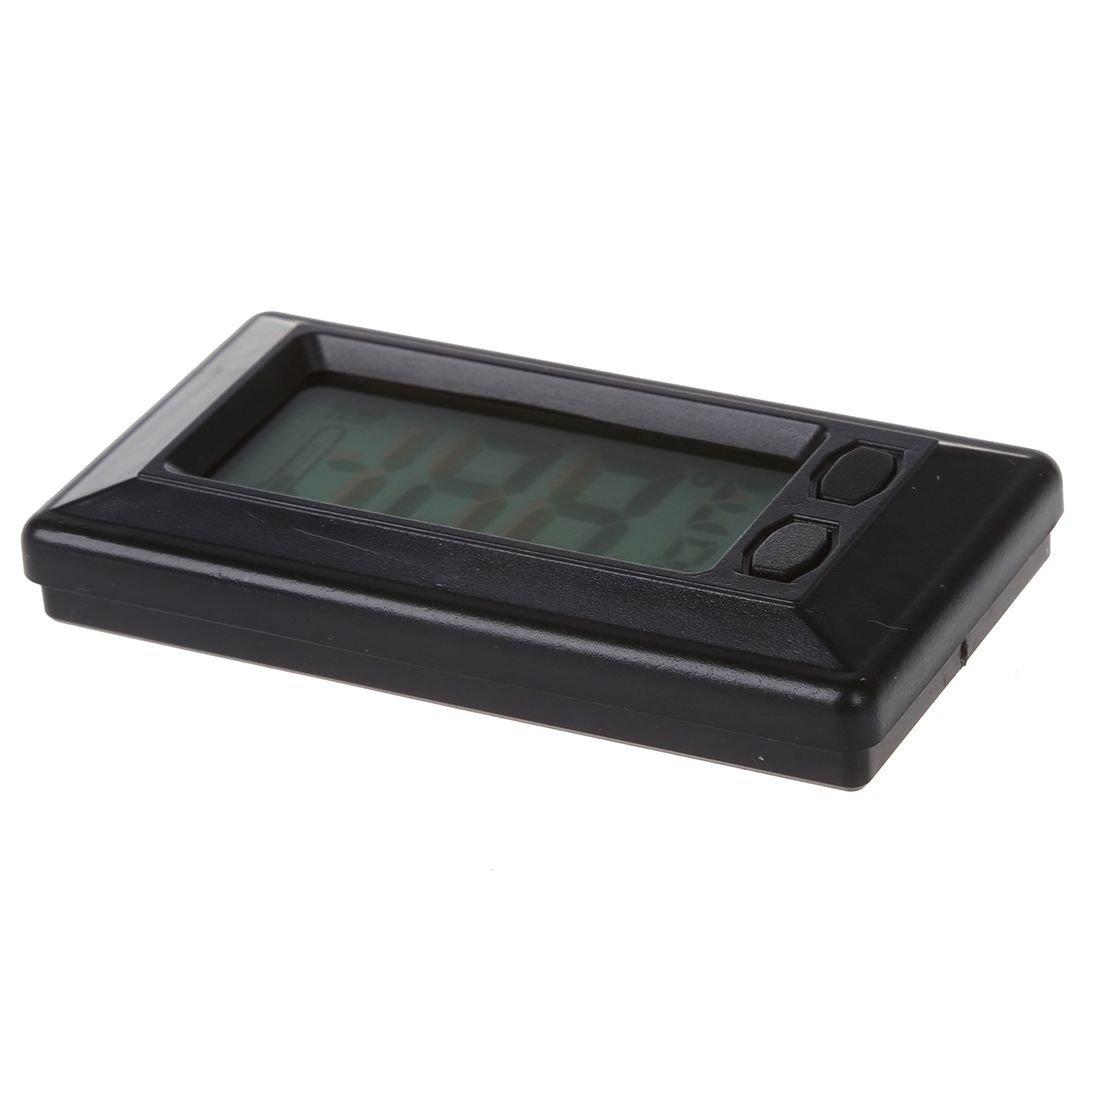 Display LCD CUHAWUDBA Termometro Digitale per Interni Auto